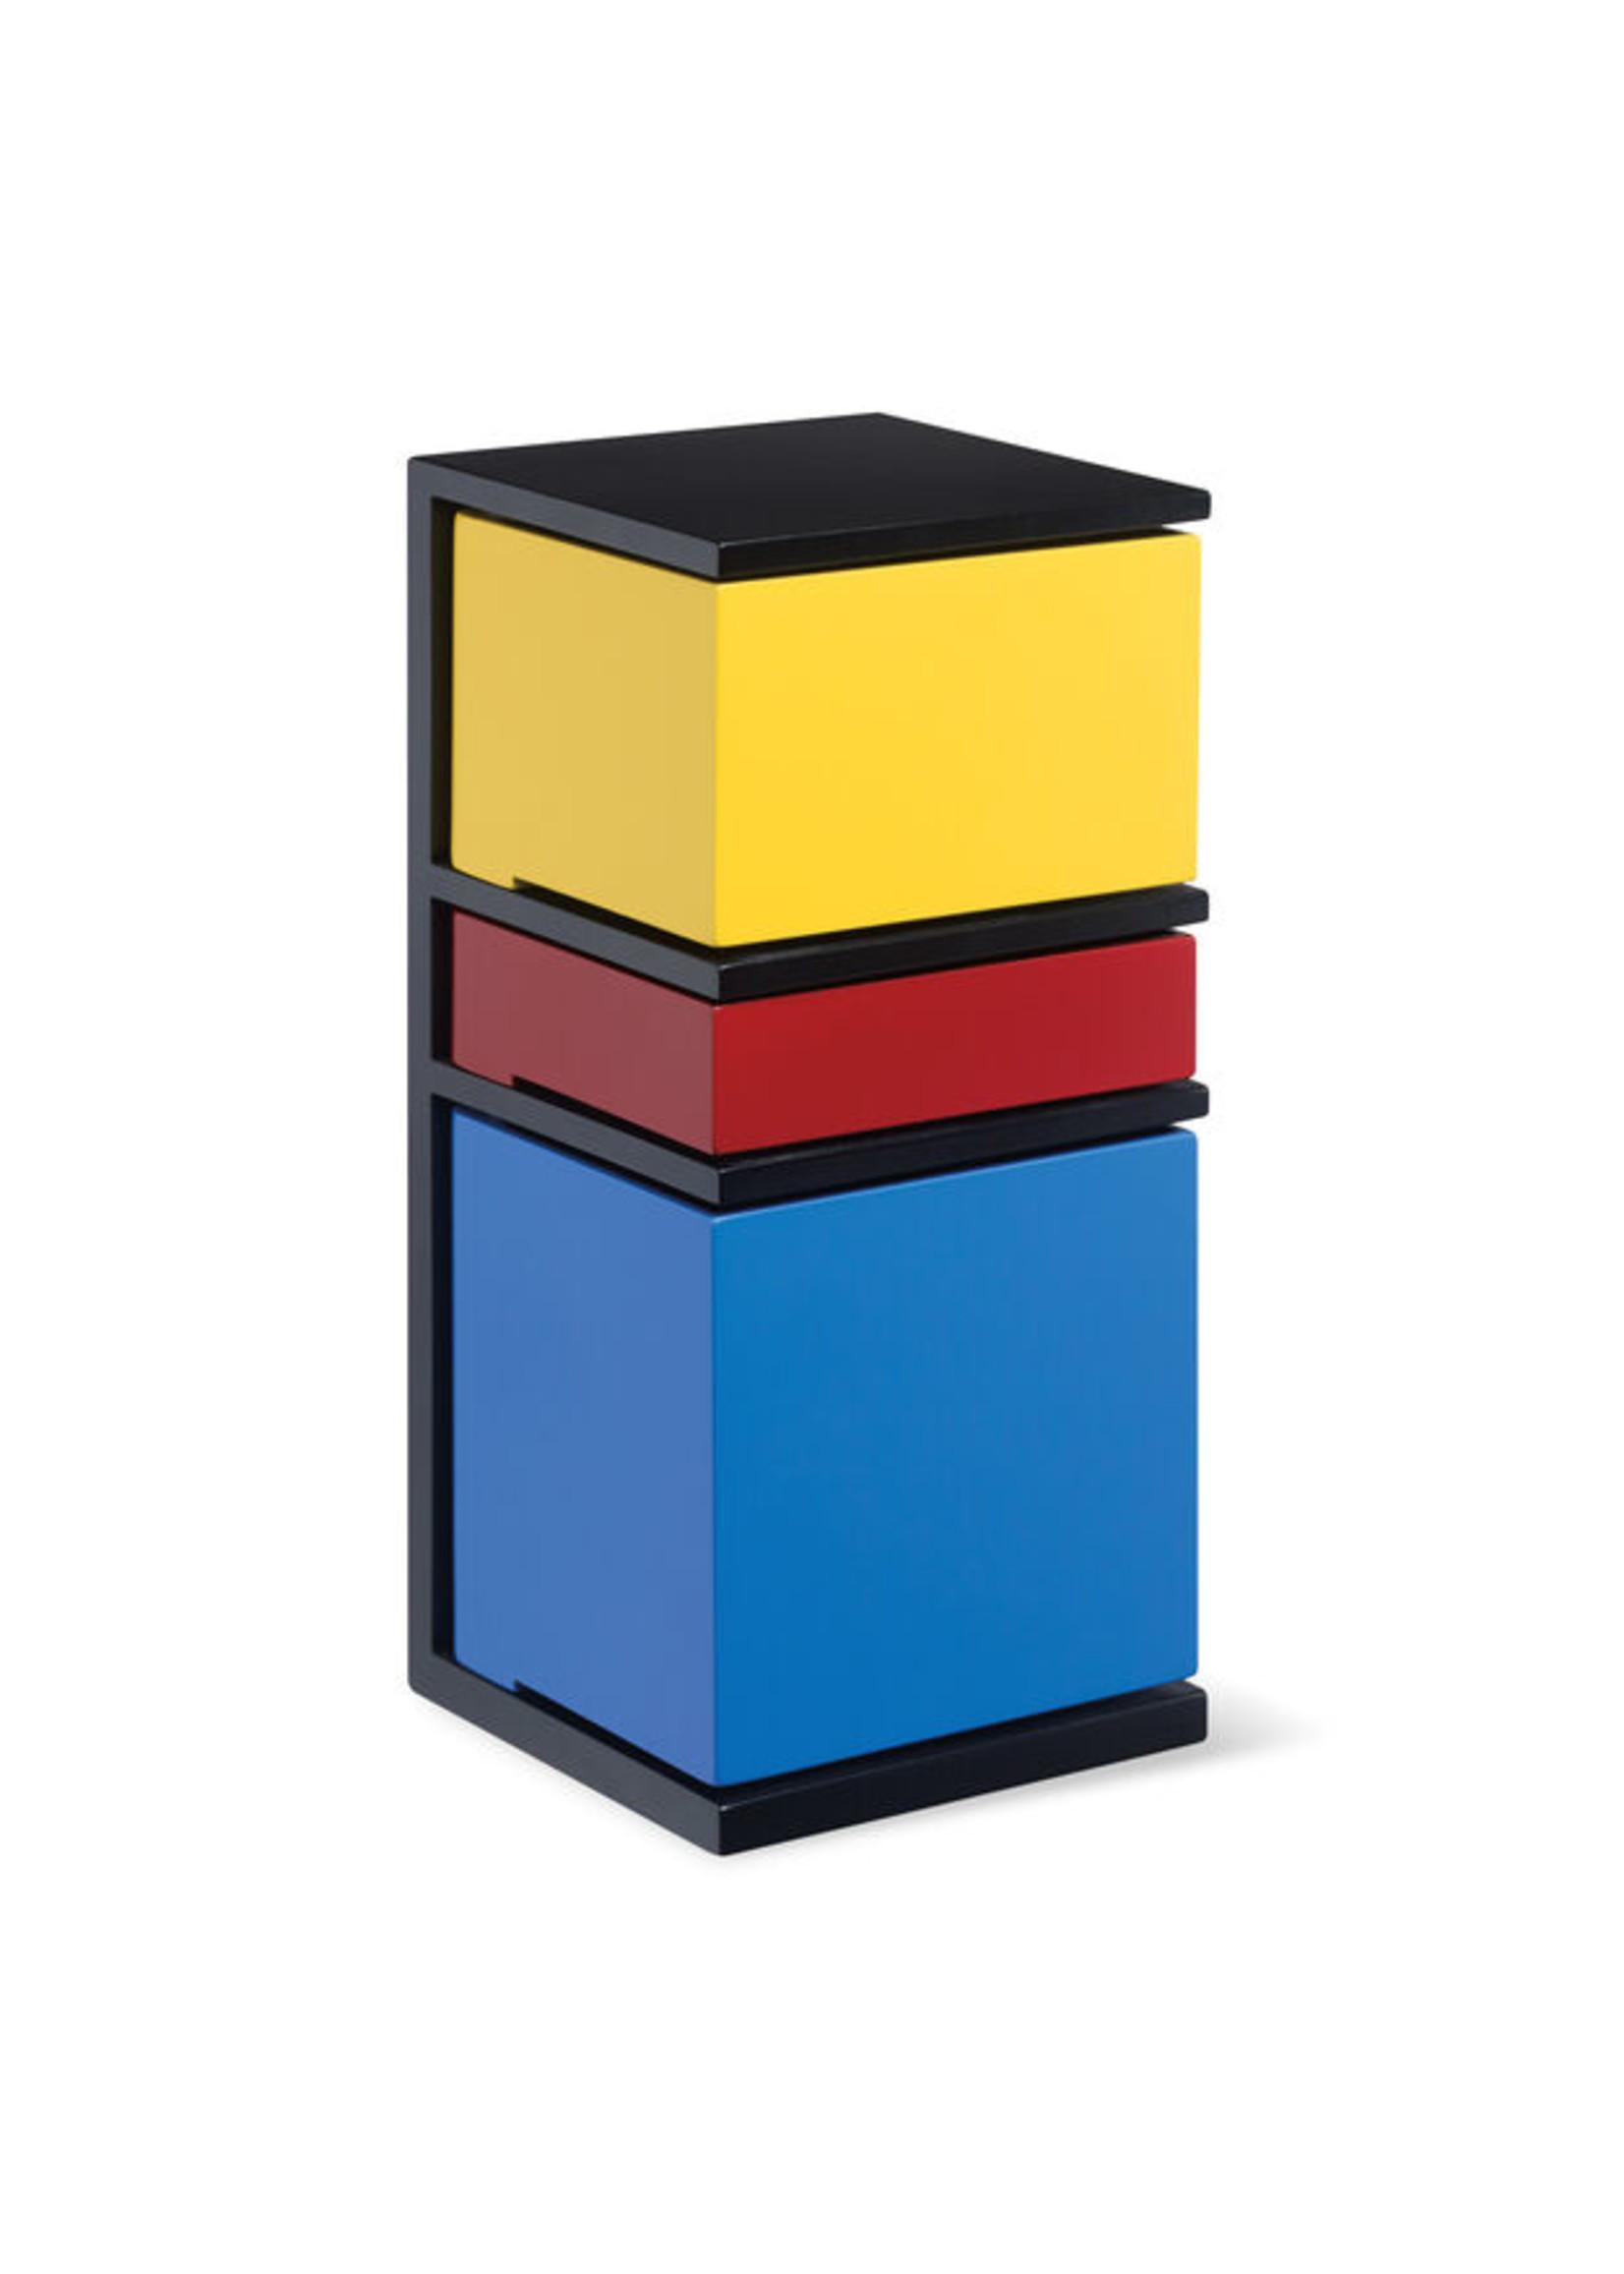 Lagerturm vom MoMA